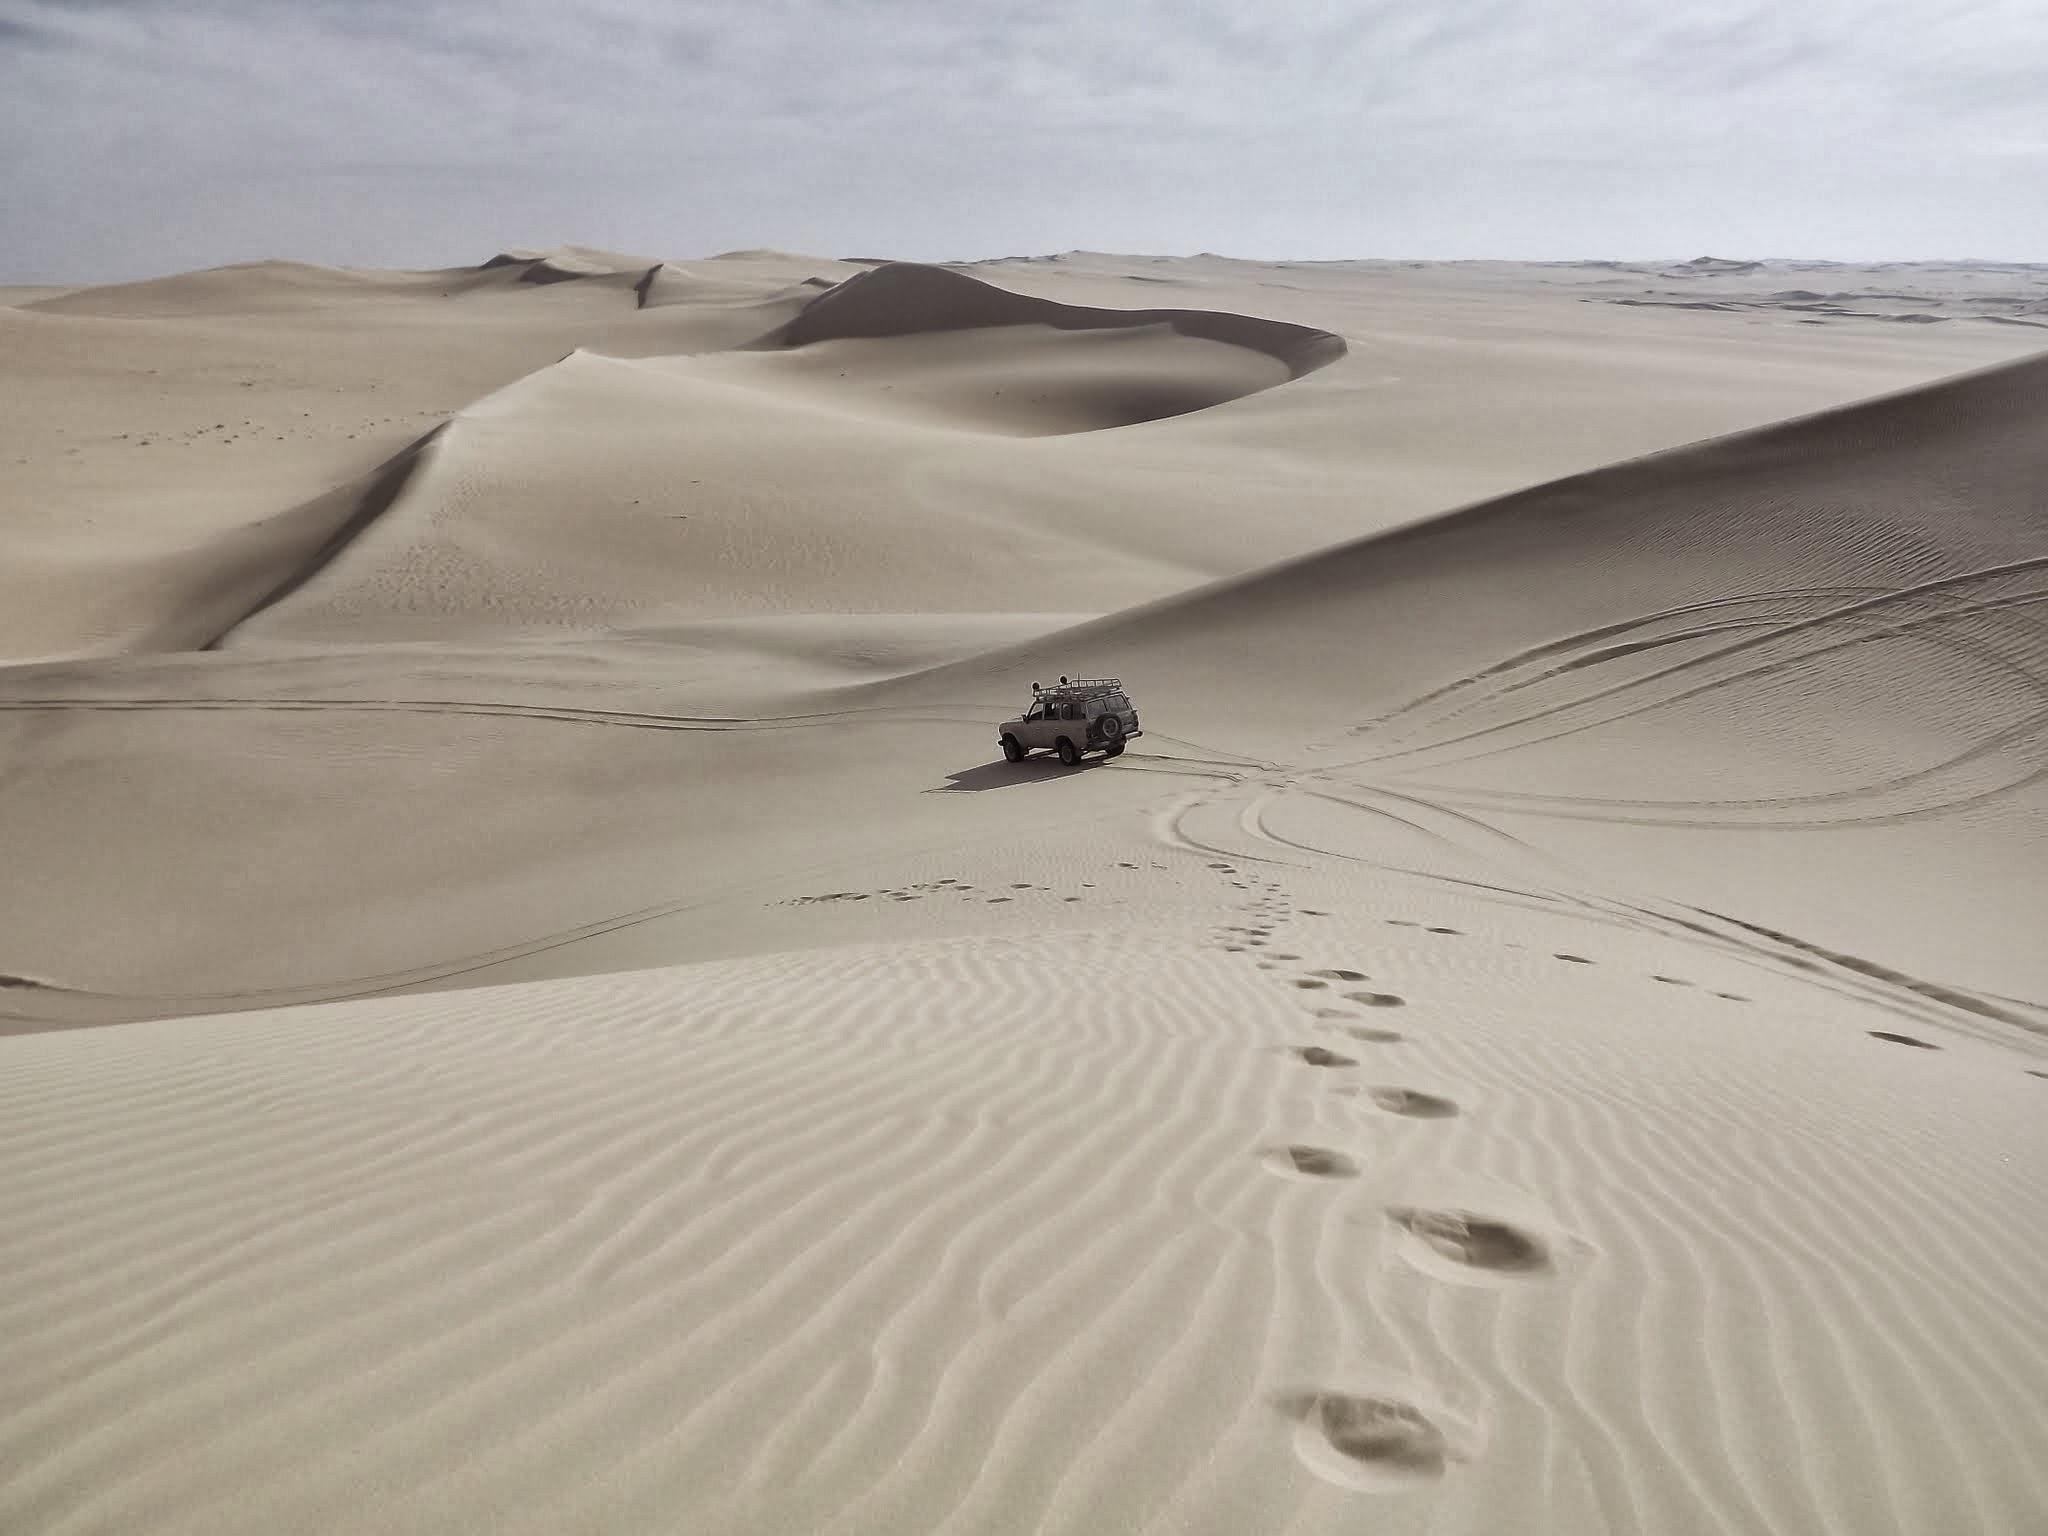 Free Images : landscape, desert, dune, jeep, habitat